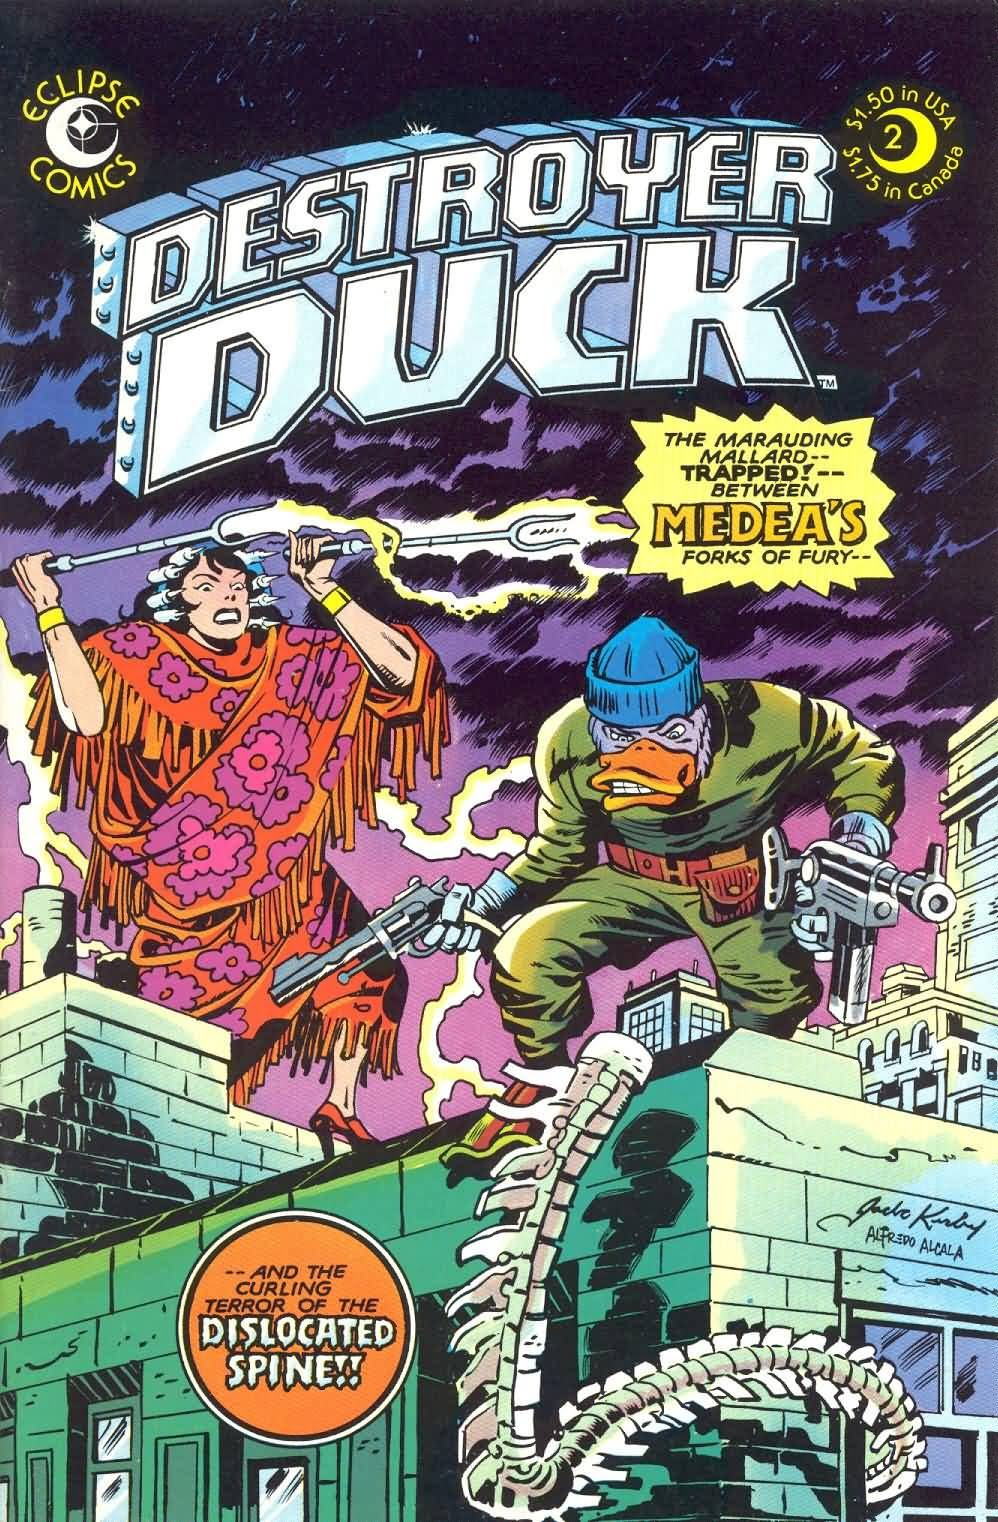 Destroyer Duck 2 Page 1